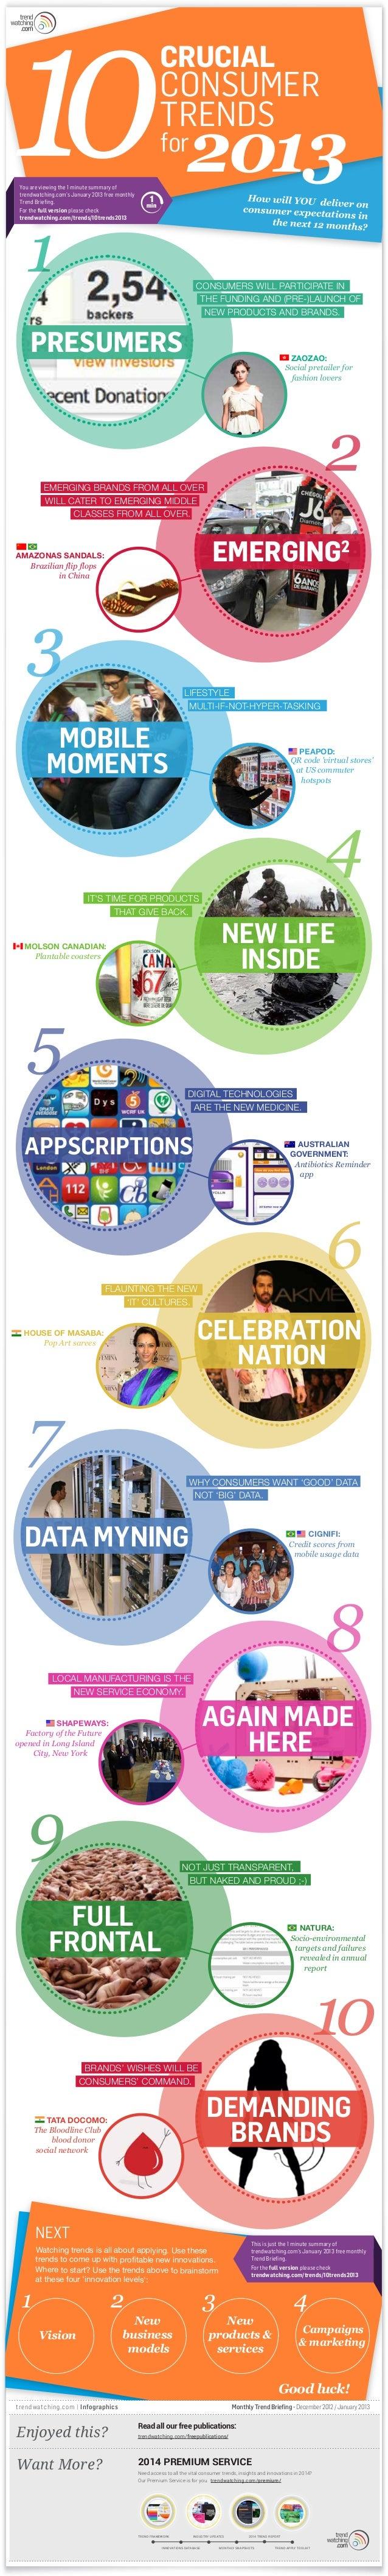 trendwatching 2013 —trendwatchingcom, cmocom , techradarcom, entrepreneurcom  — blackbaud, the next generation of american giving, aug 2013.